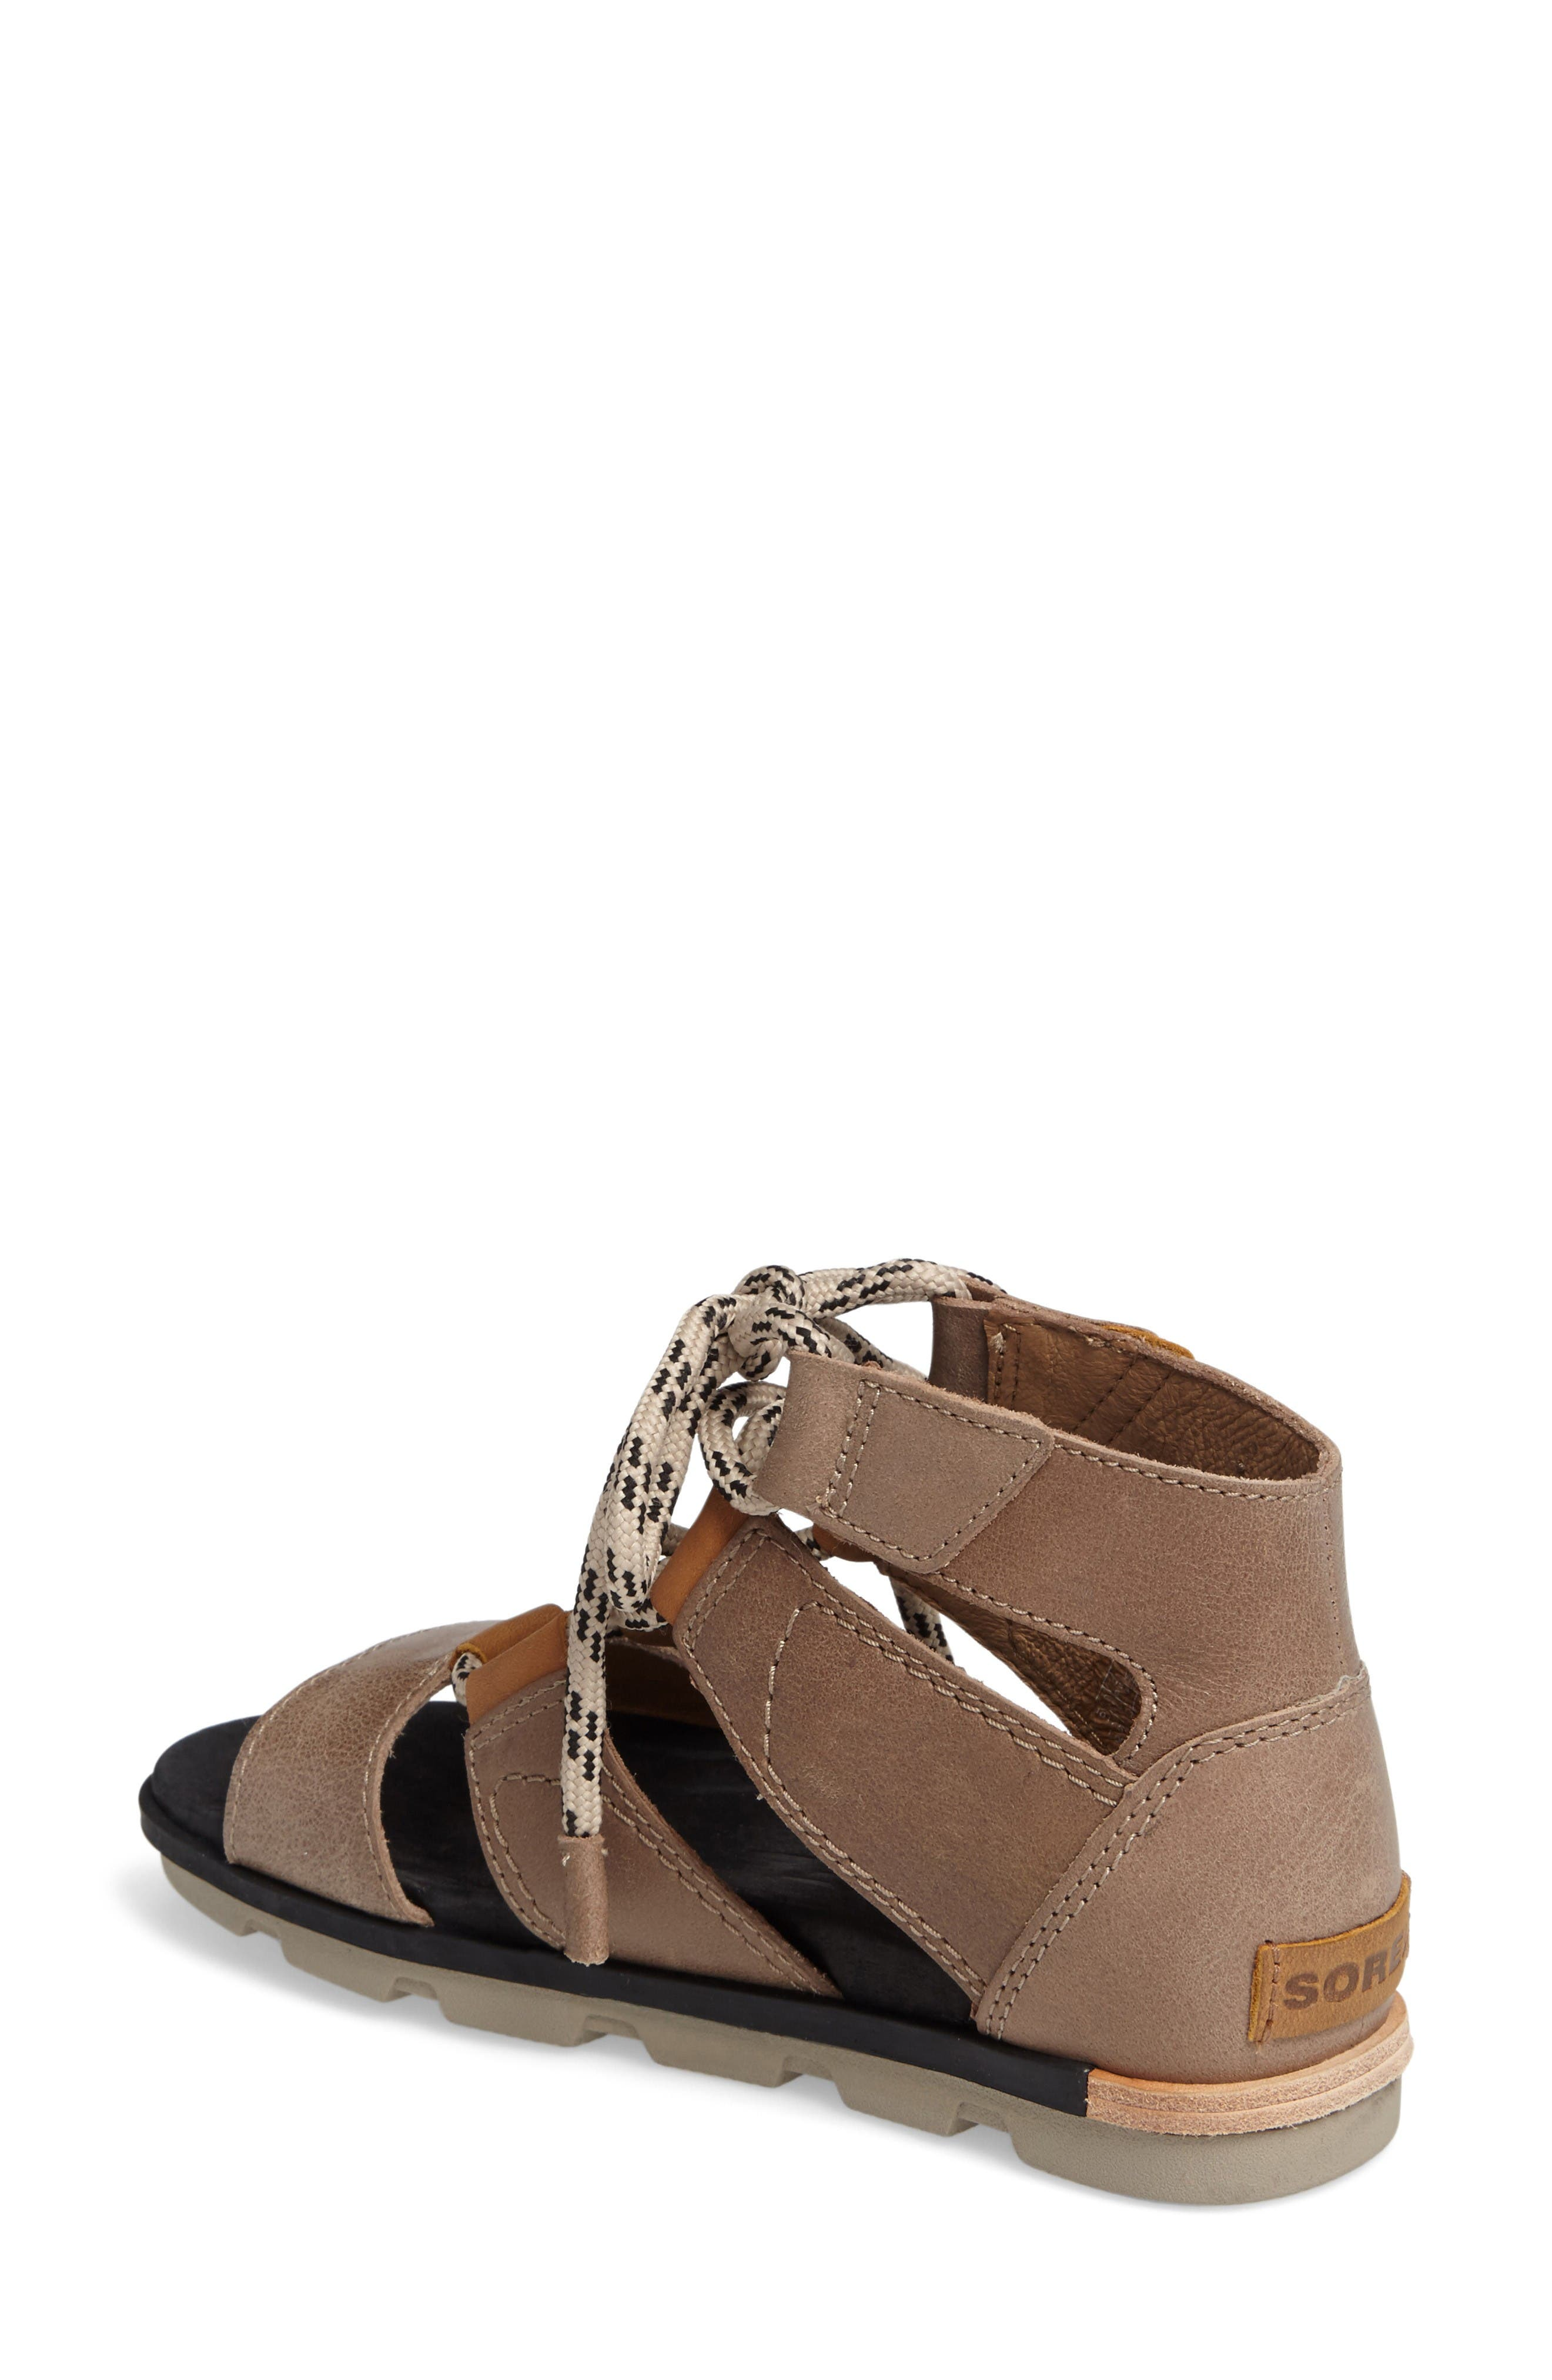 Alternate Image 2  - SOREL 'Torpeda' Lace-Up Sandal (Women)